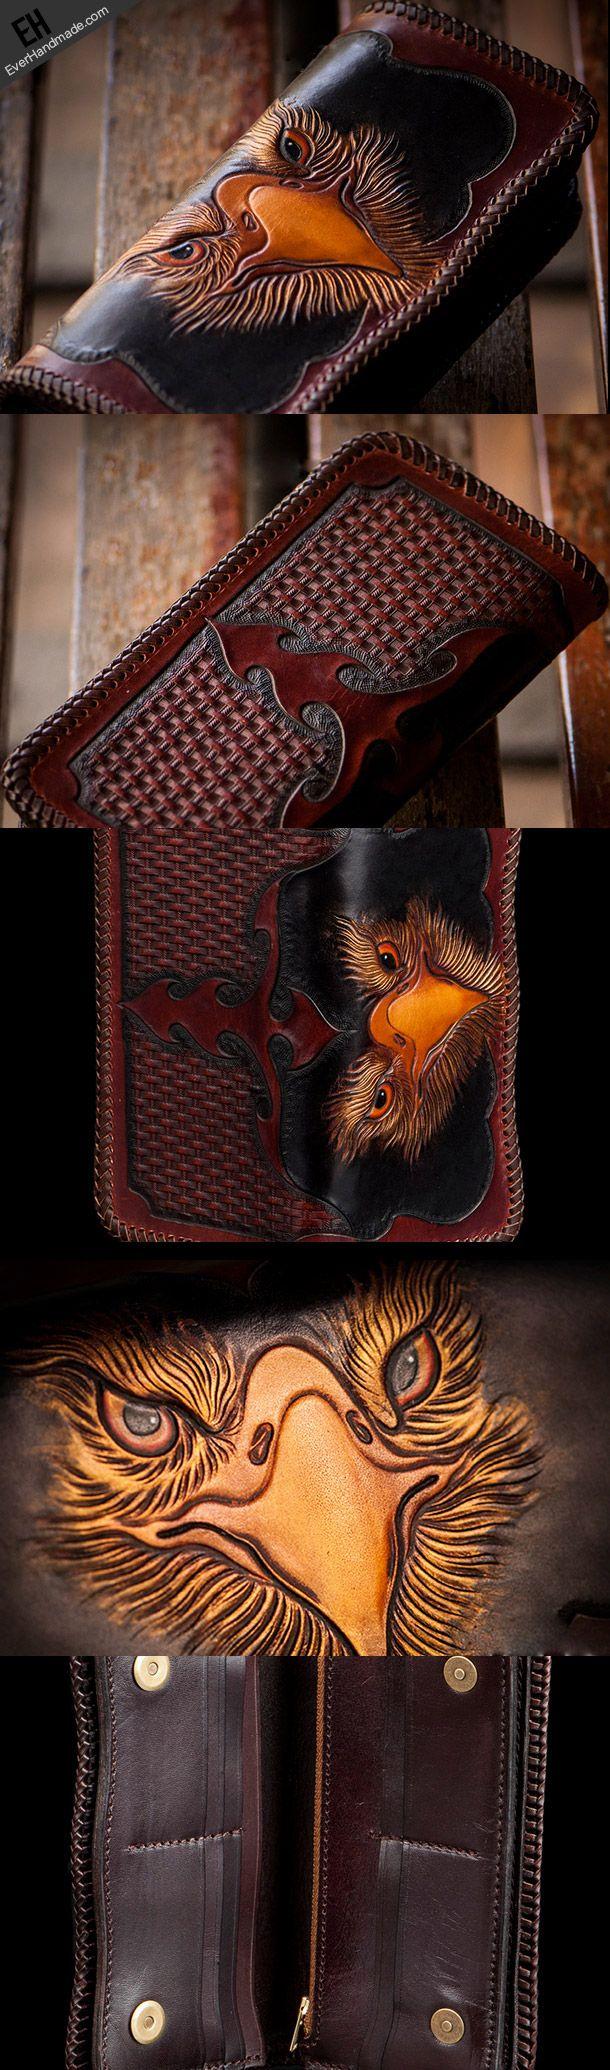 Art Bird Genuine Leather Passport Holder Wallet Case Cover for Men Women